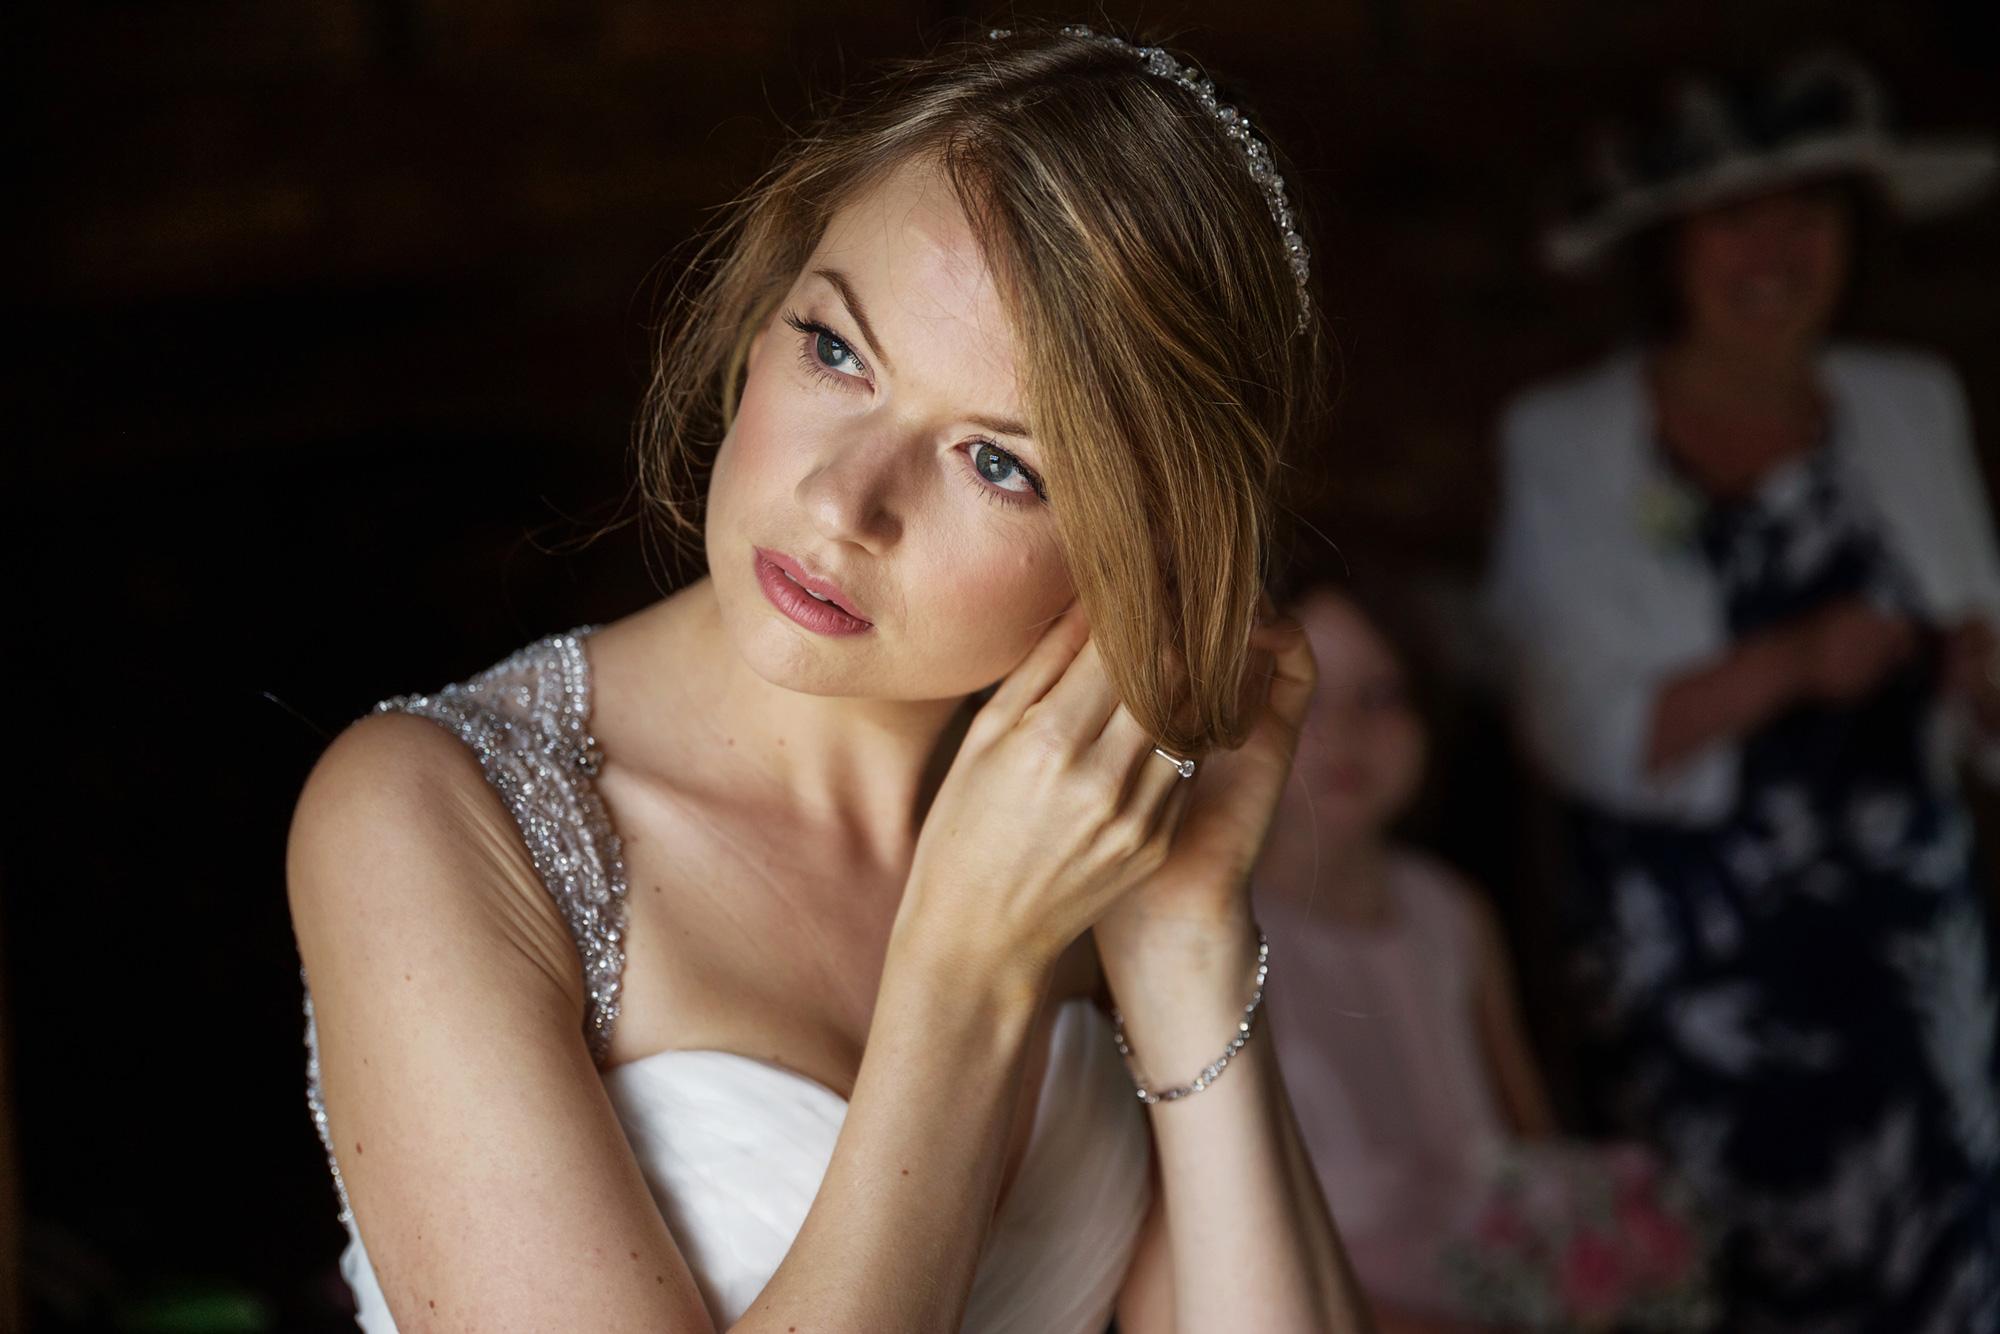 Adam_Hillier_Wedding_Photographer_Newbury_Berkshire_4 (6).jpg